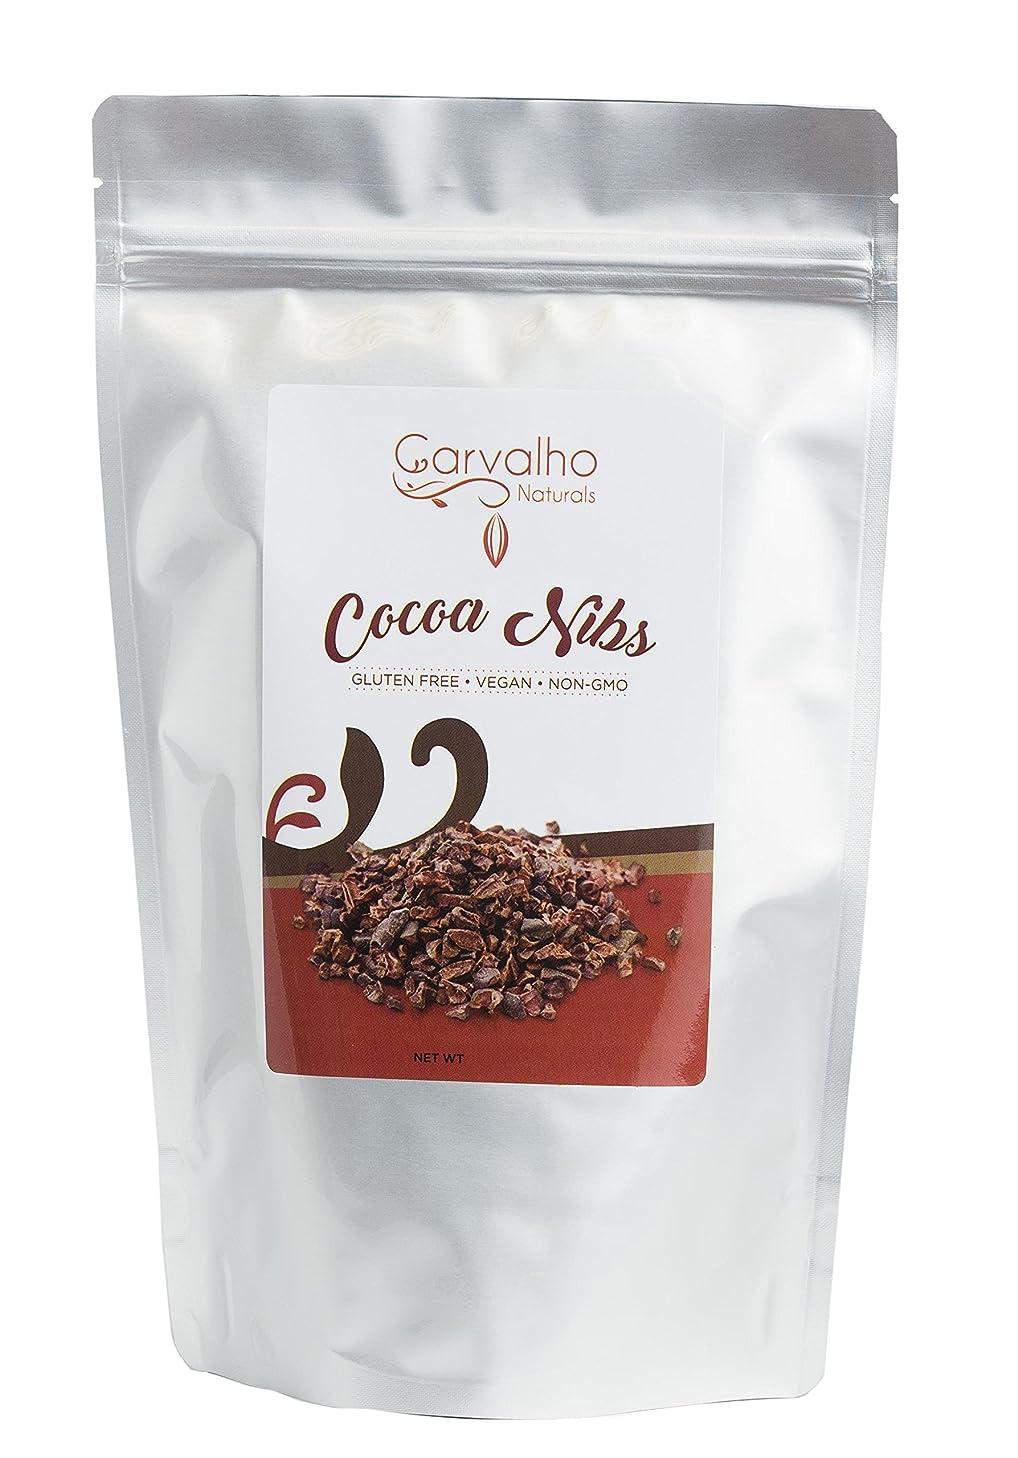 Carvalho Naturals Organic Cocoa Nibs, Unsweetened Cocoa Nibs, Non-GMO, Kosher, Vegan & Gluten Free Cocoa Nibs, 16 Oz